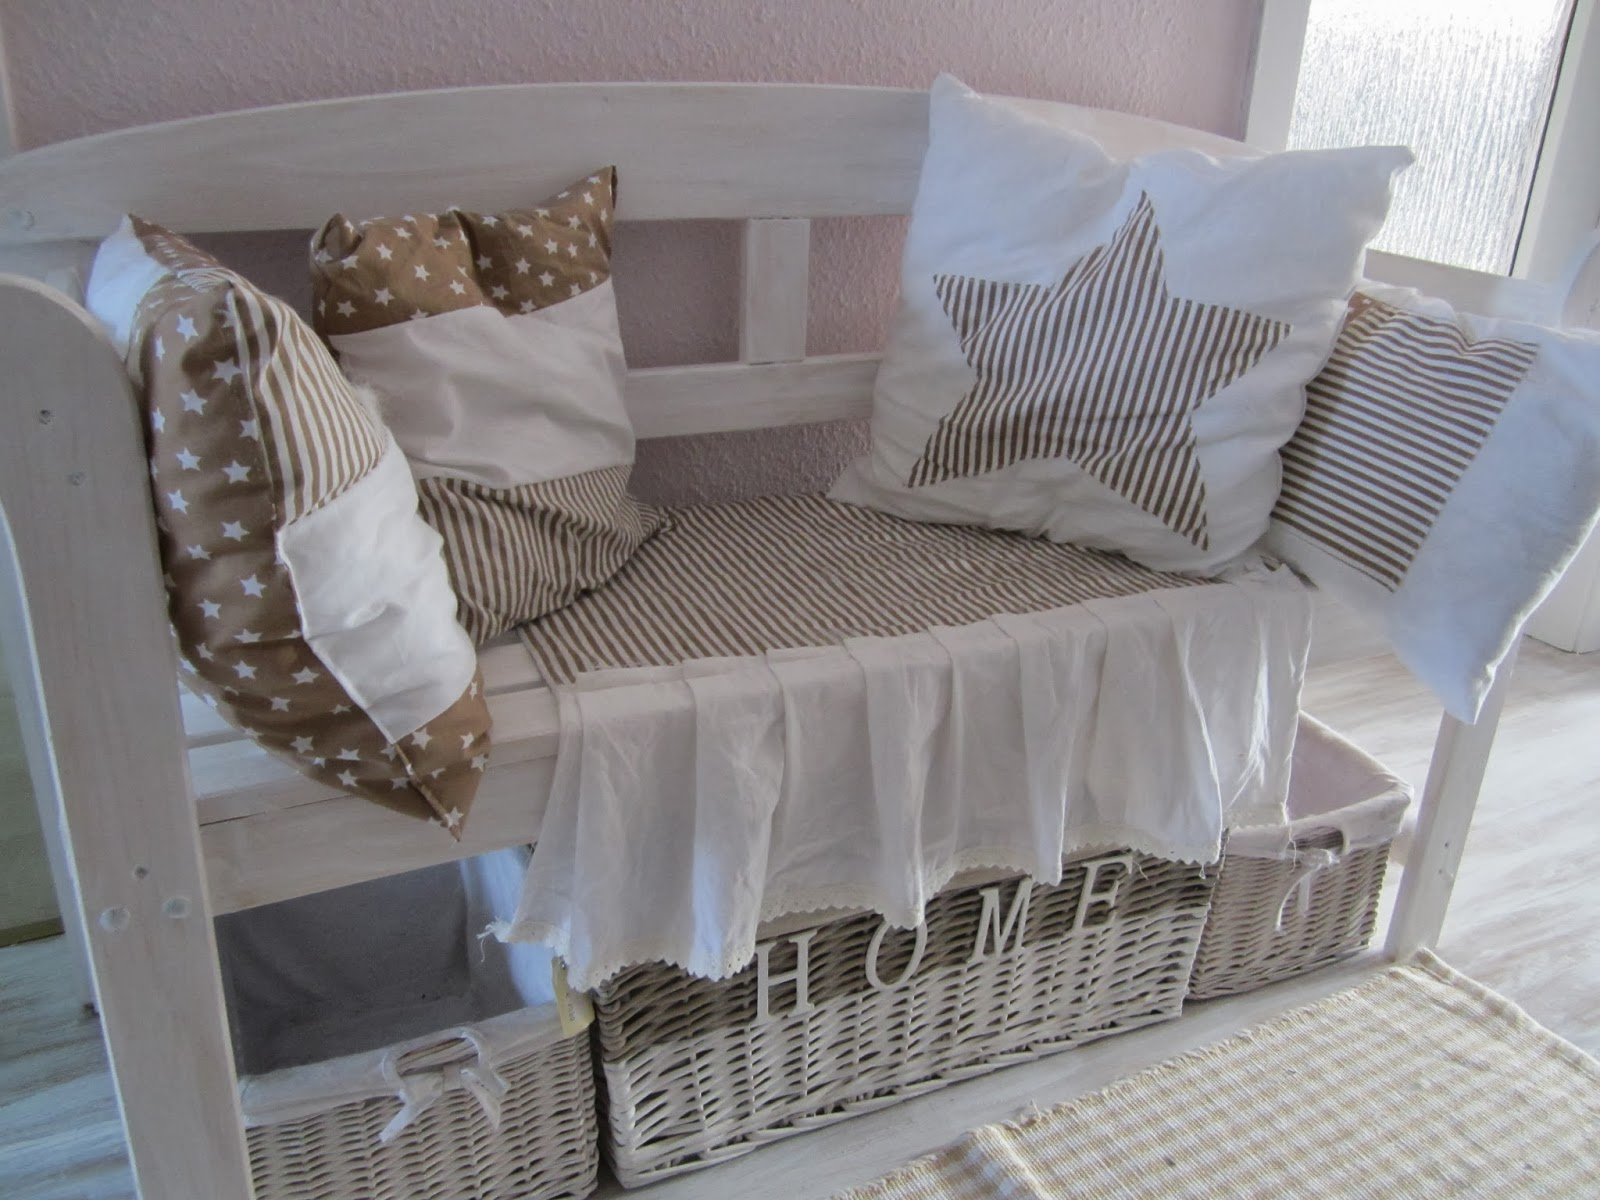 Le panche divano in stile shabby chic